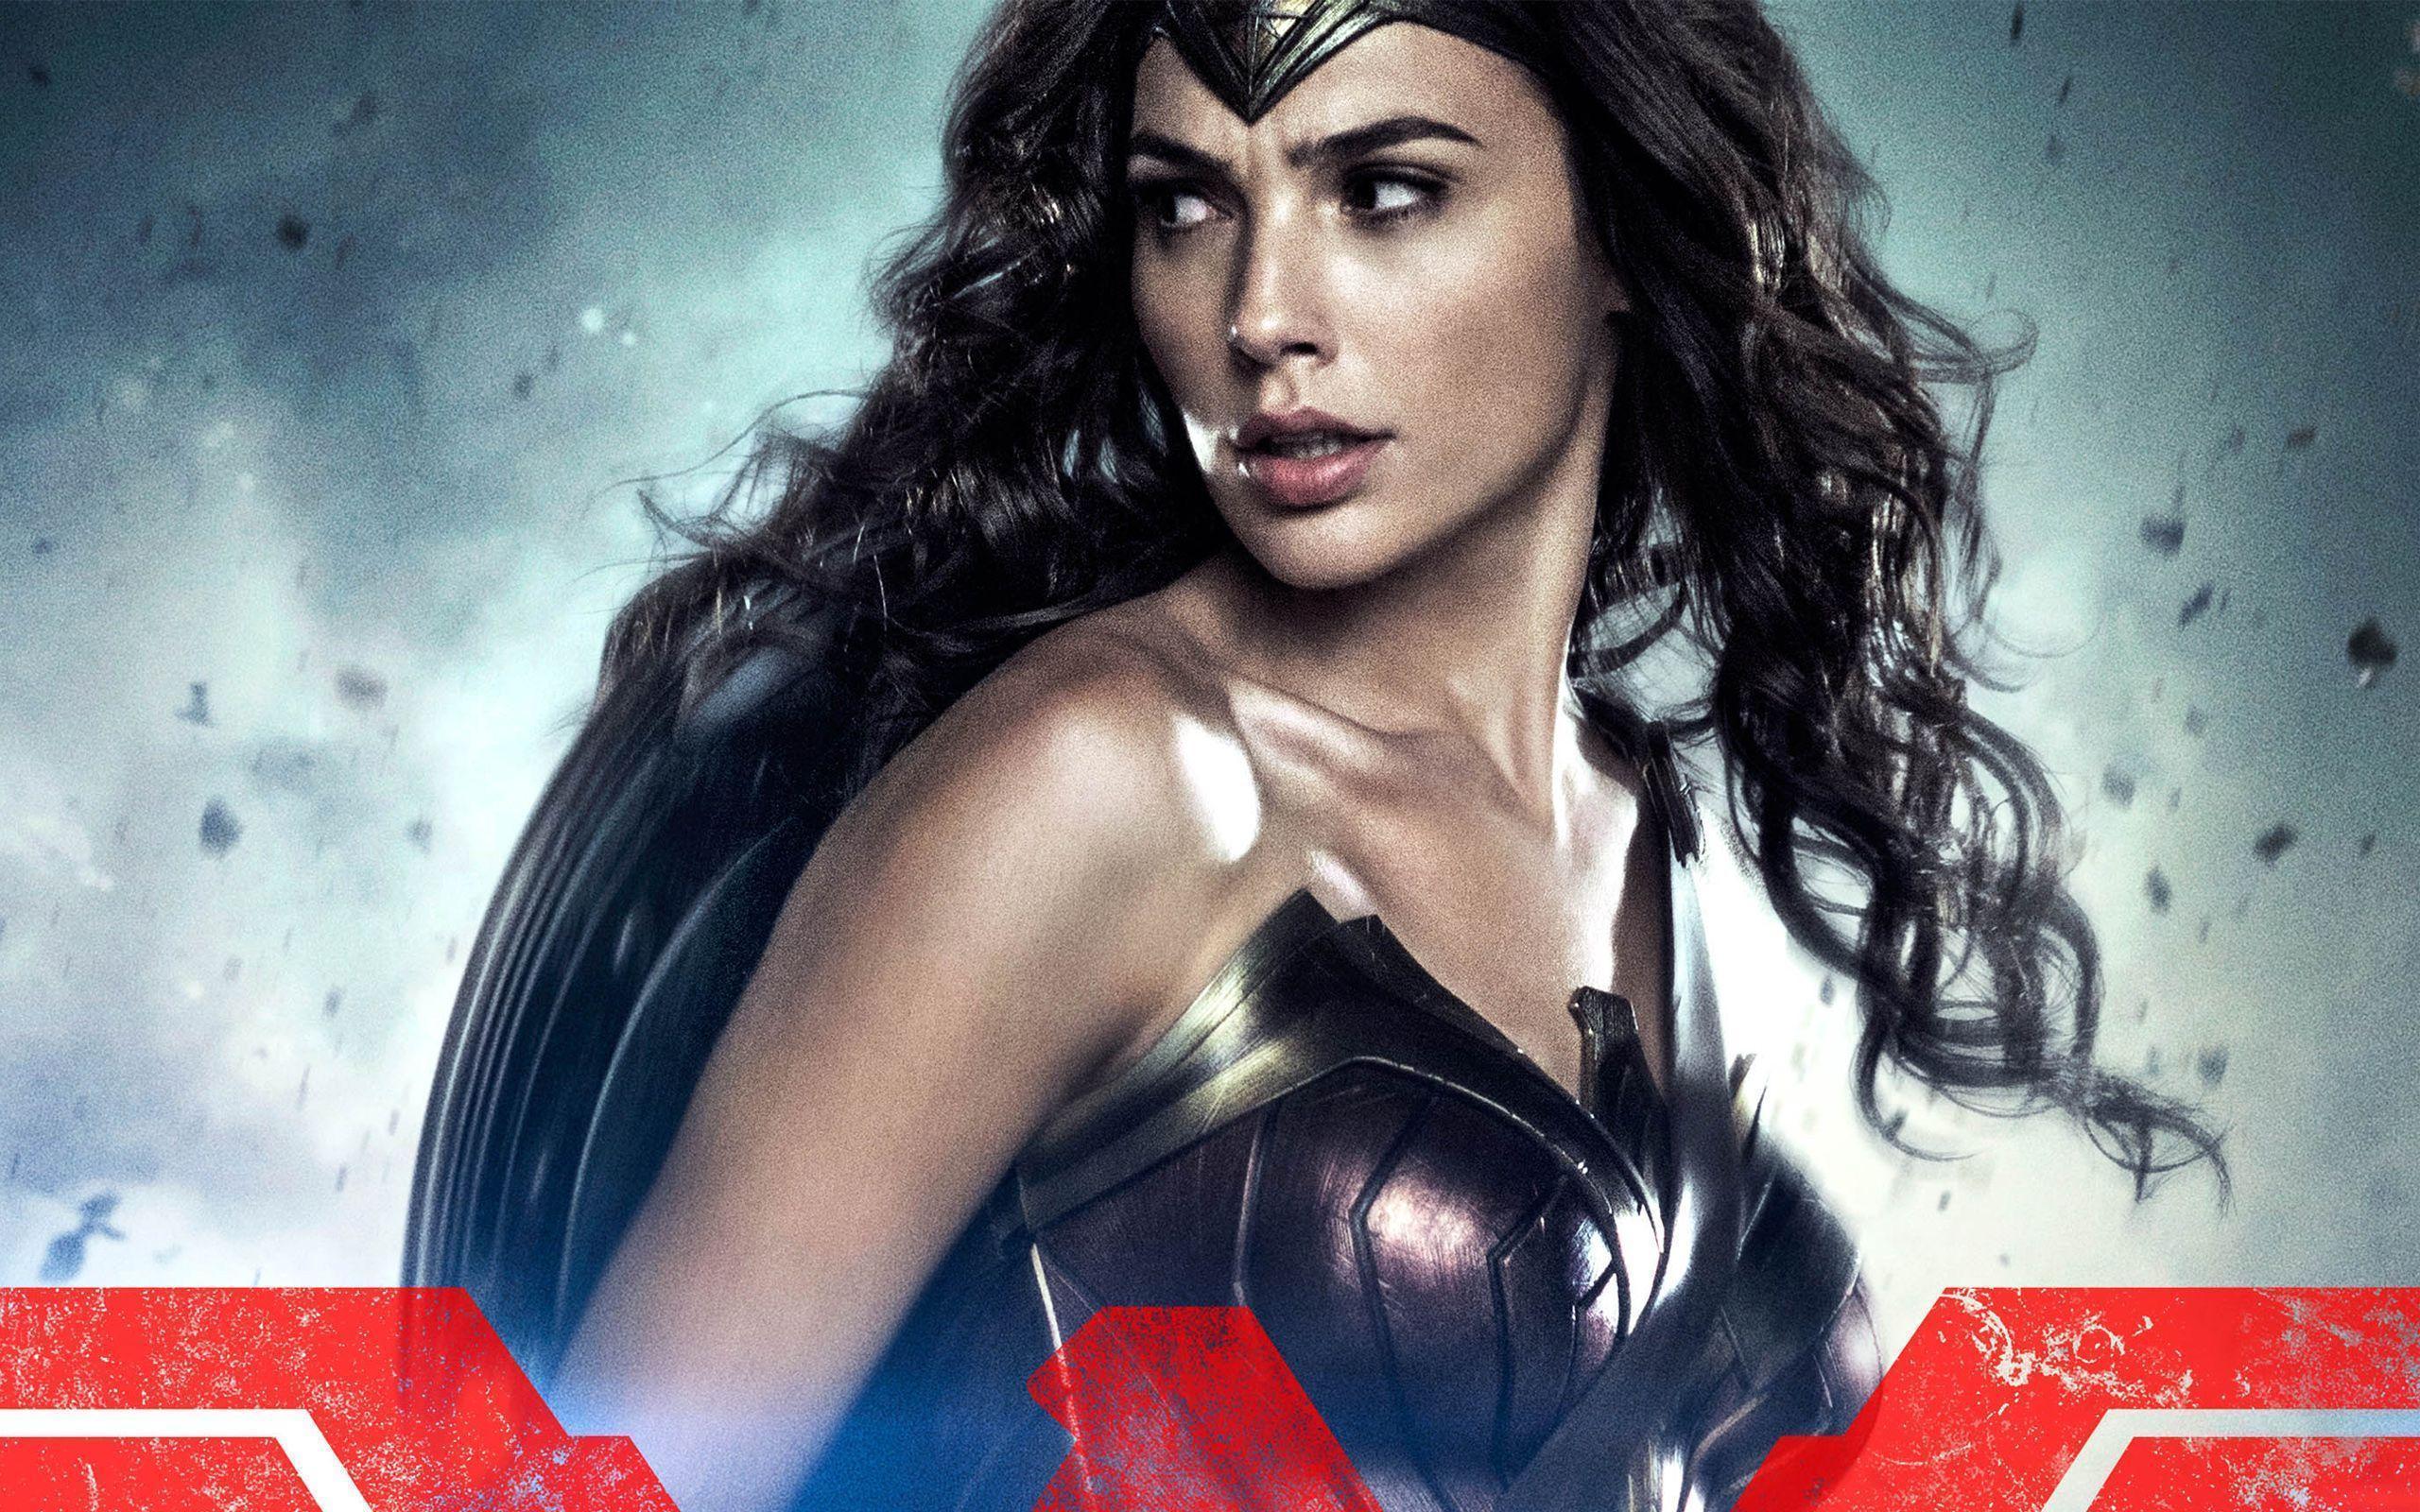 Batman v Superman Wonder Woman Wallpapers | HD Wallpapers